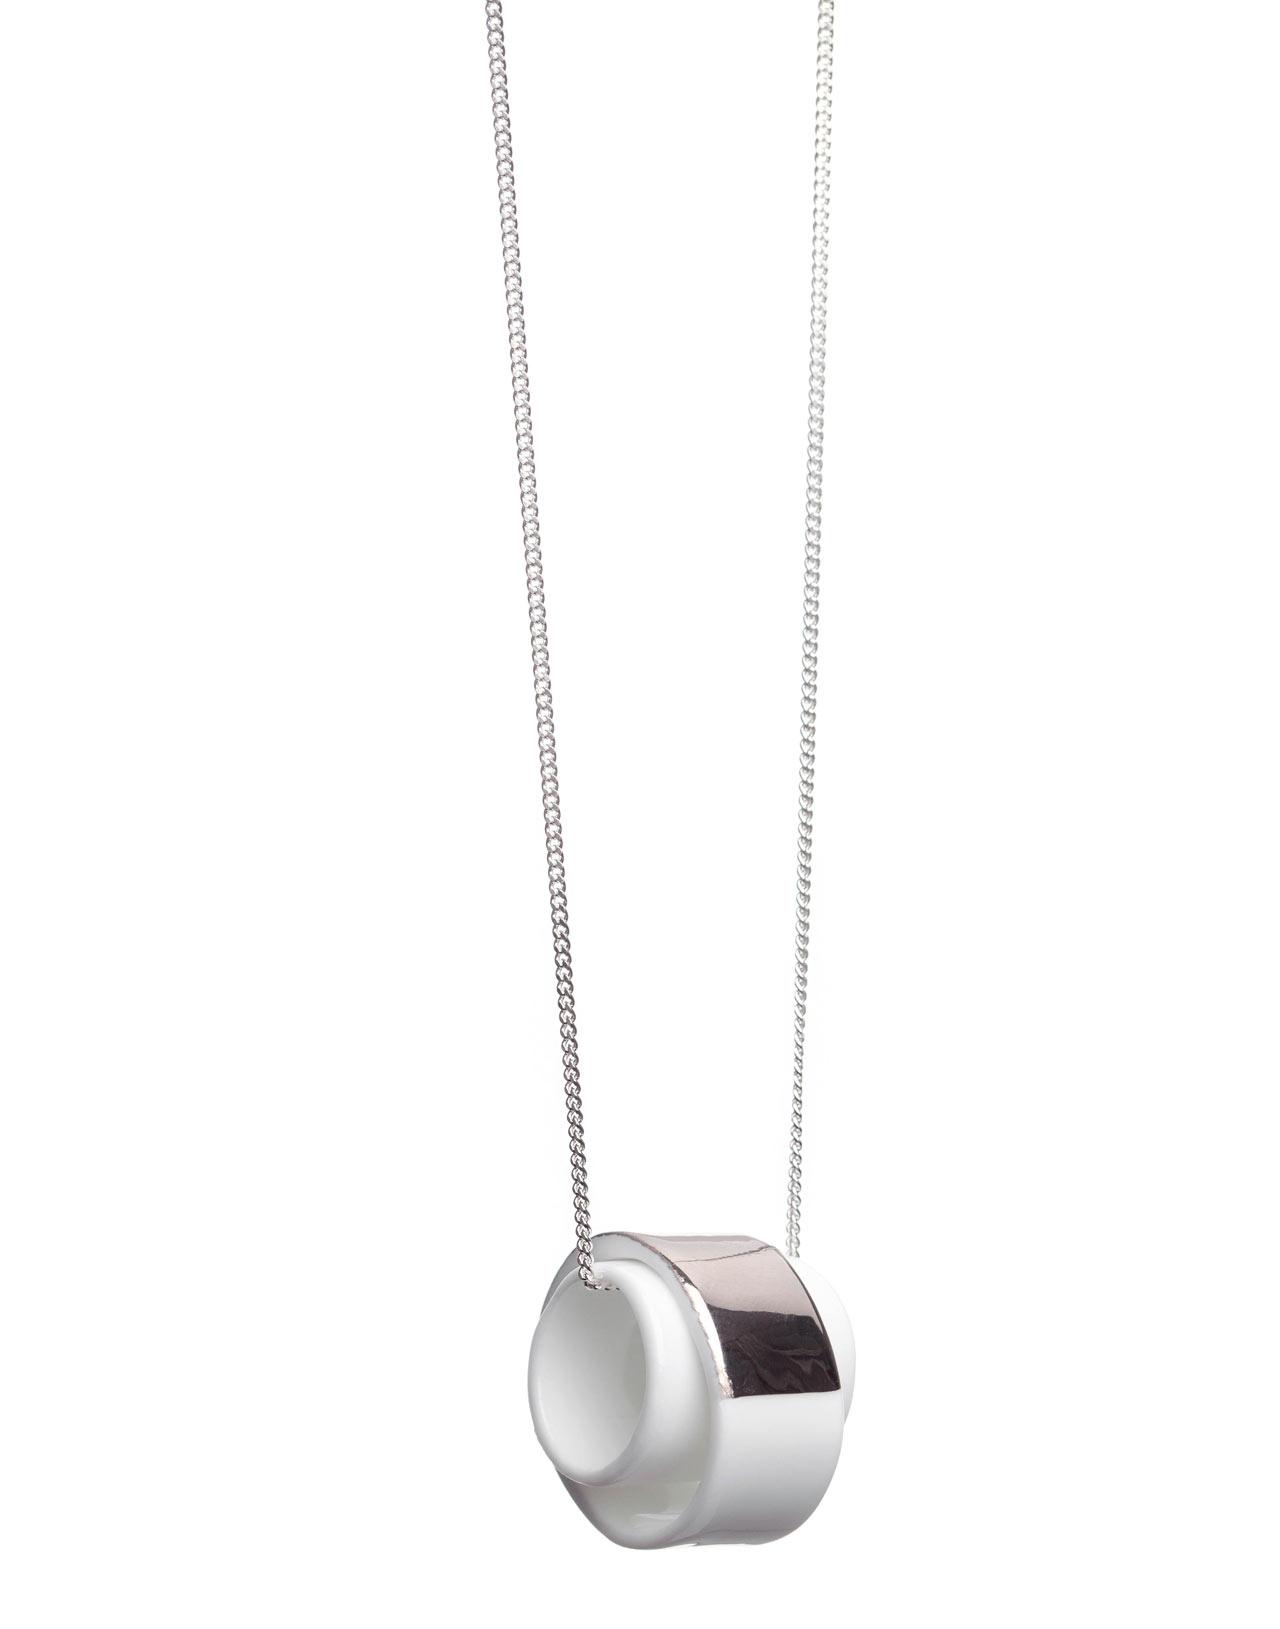 Hula_Reiko_kaneko_Fine_bone_china_jewelry_silver